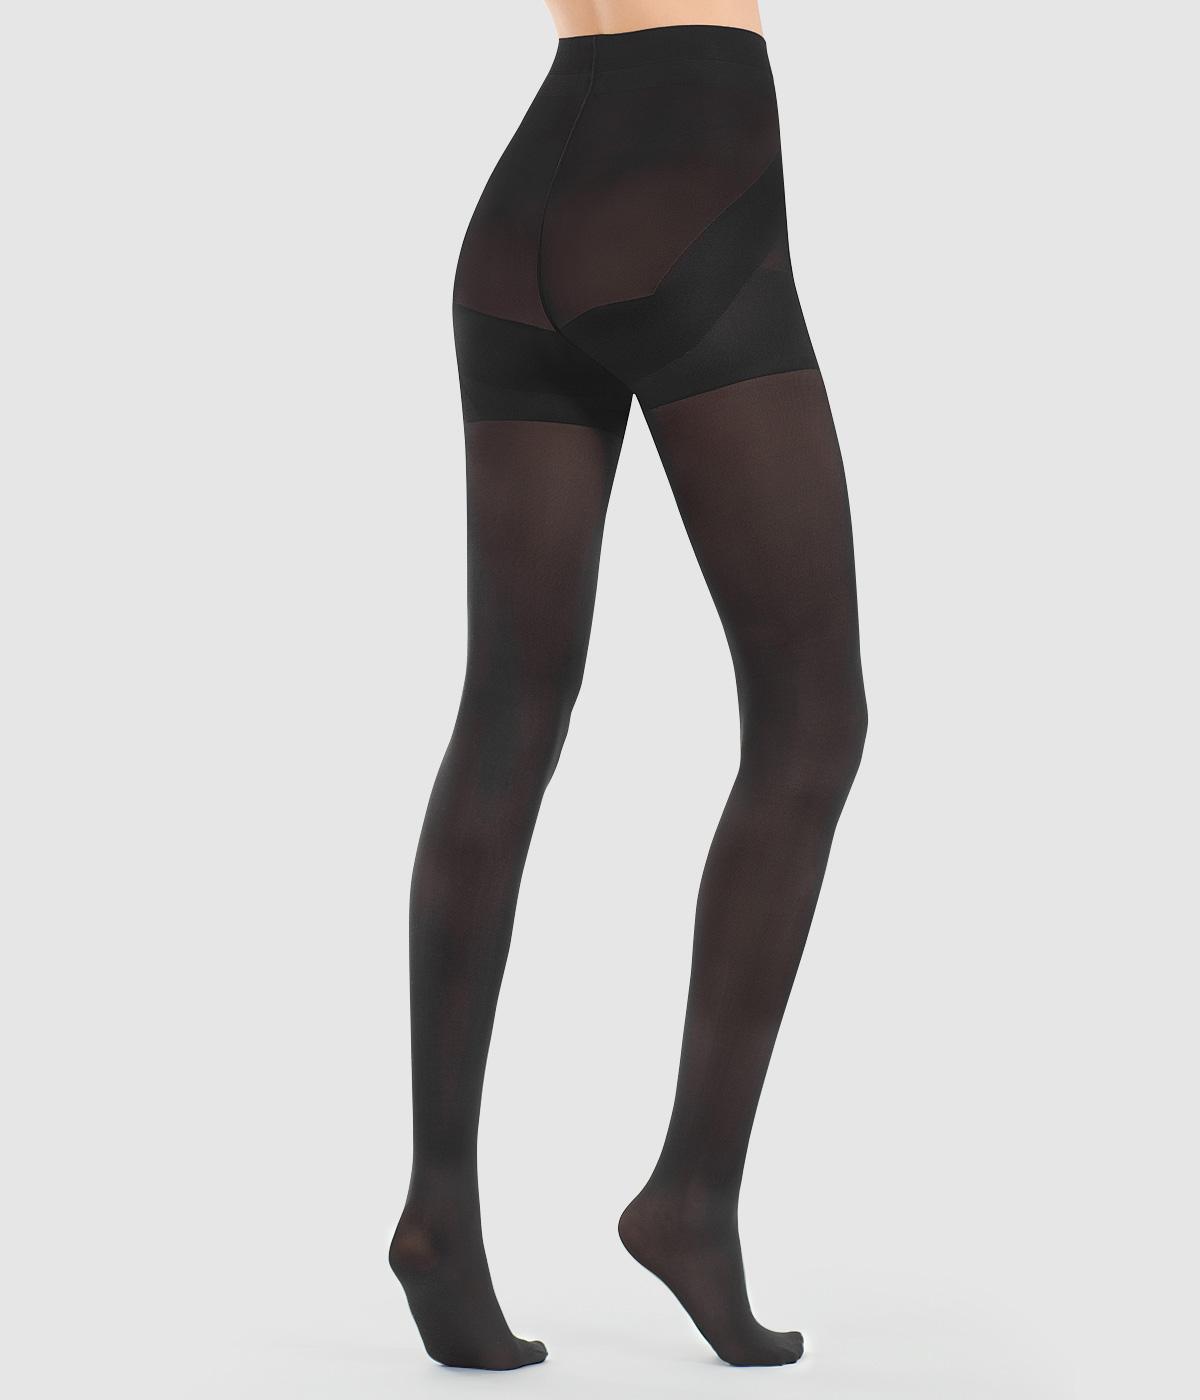 Marie Claire Panty Benefit 100 - Panty adelgazante opaco - Comprar online BIGARTE